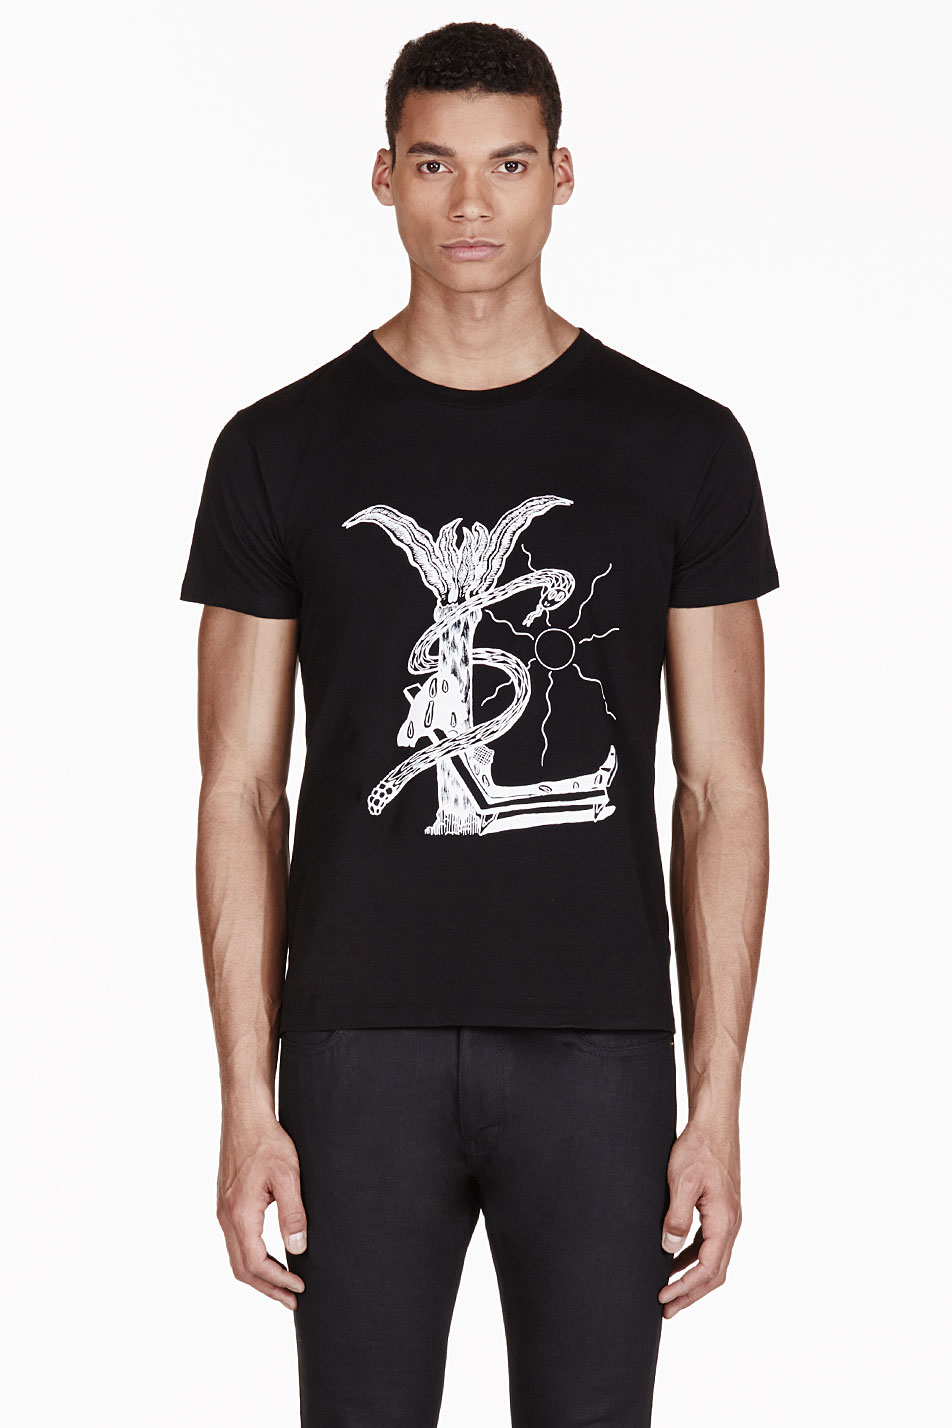 Saint laurent black modified ysl logo t shirt for Ysl logo tee shirt